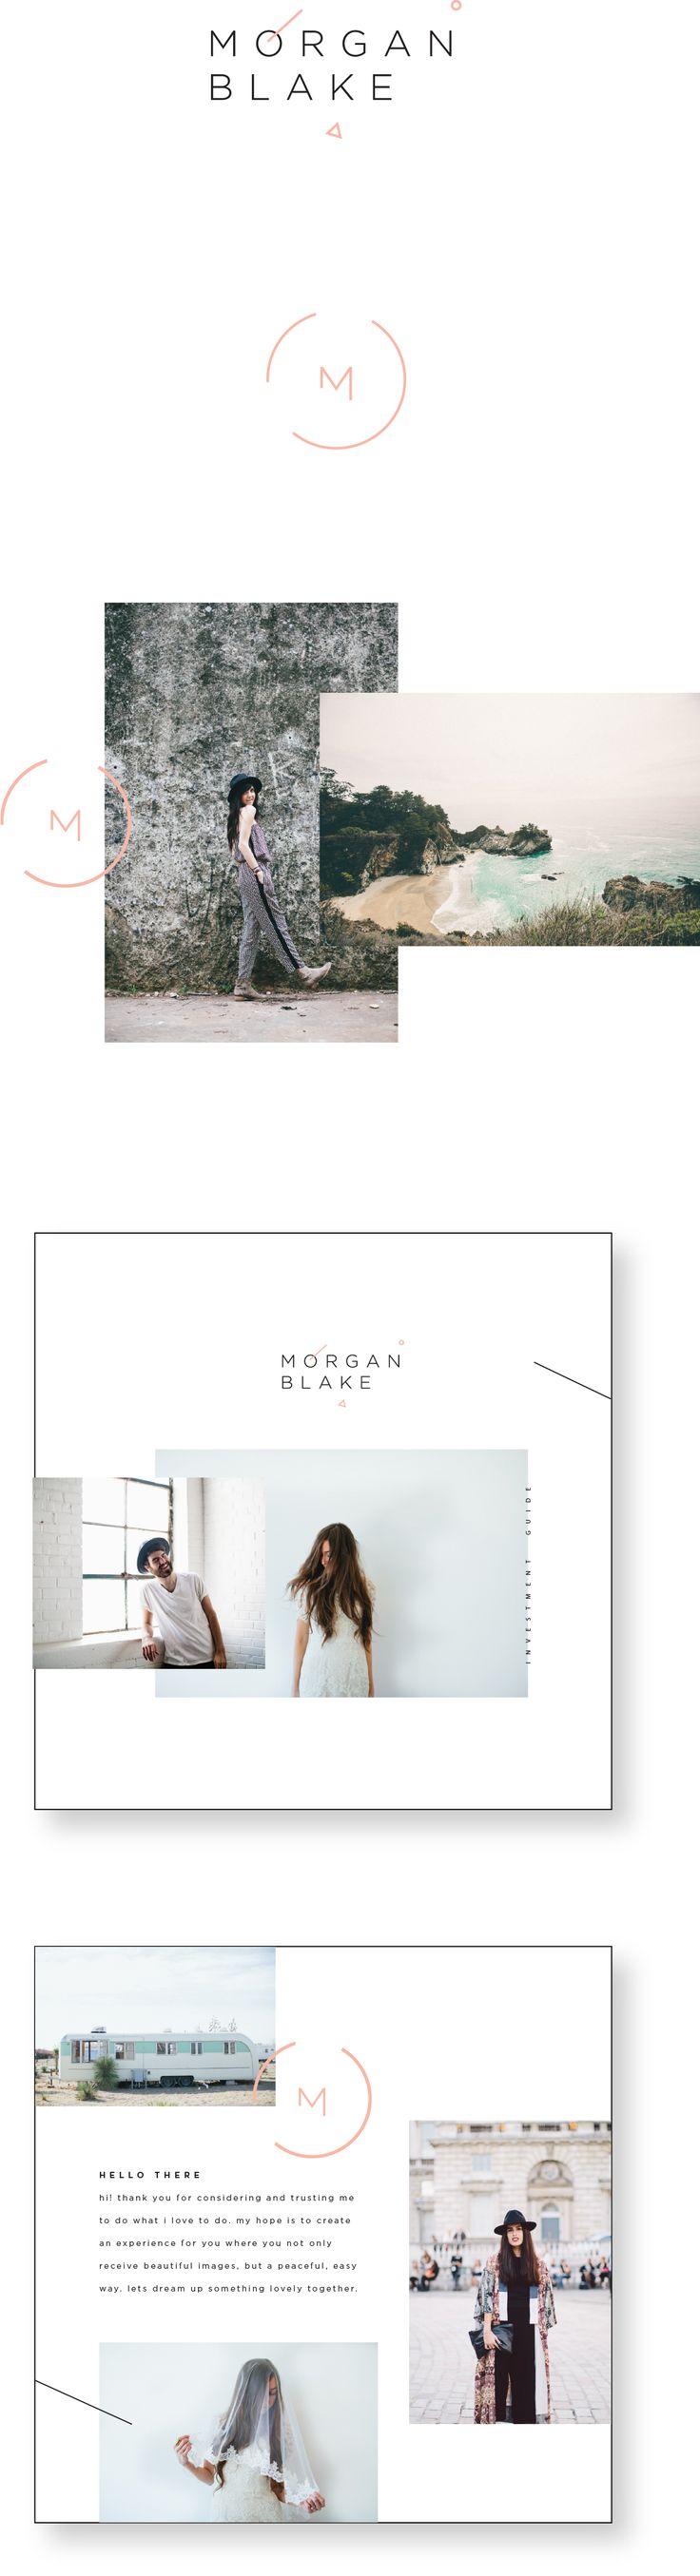 Moe Blake - LIZ DESIGNS THINGS | the portfolio of liz grant